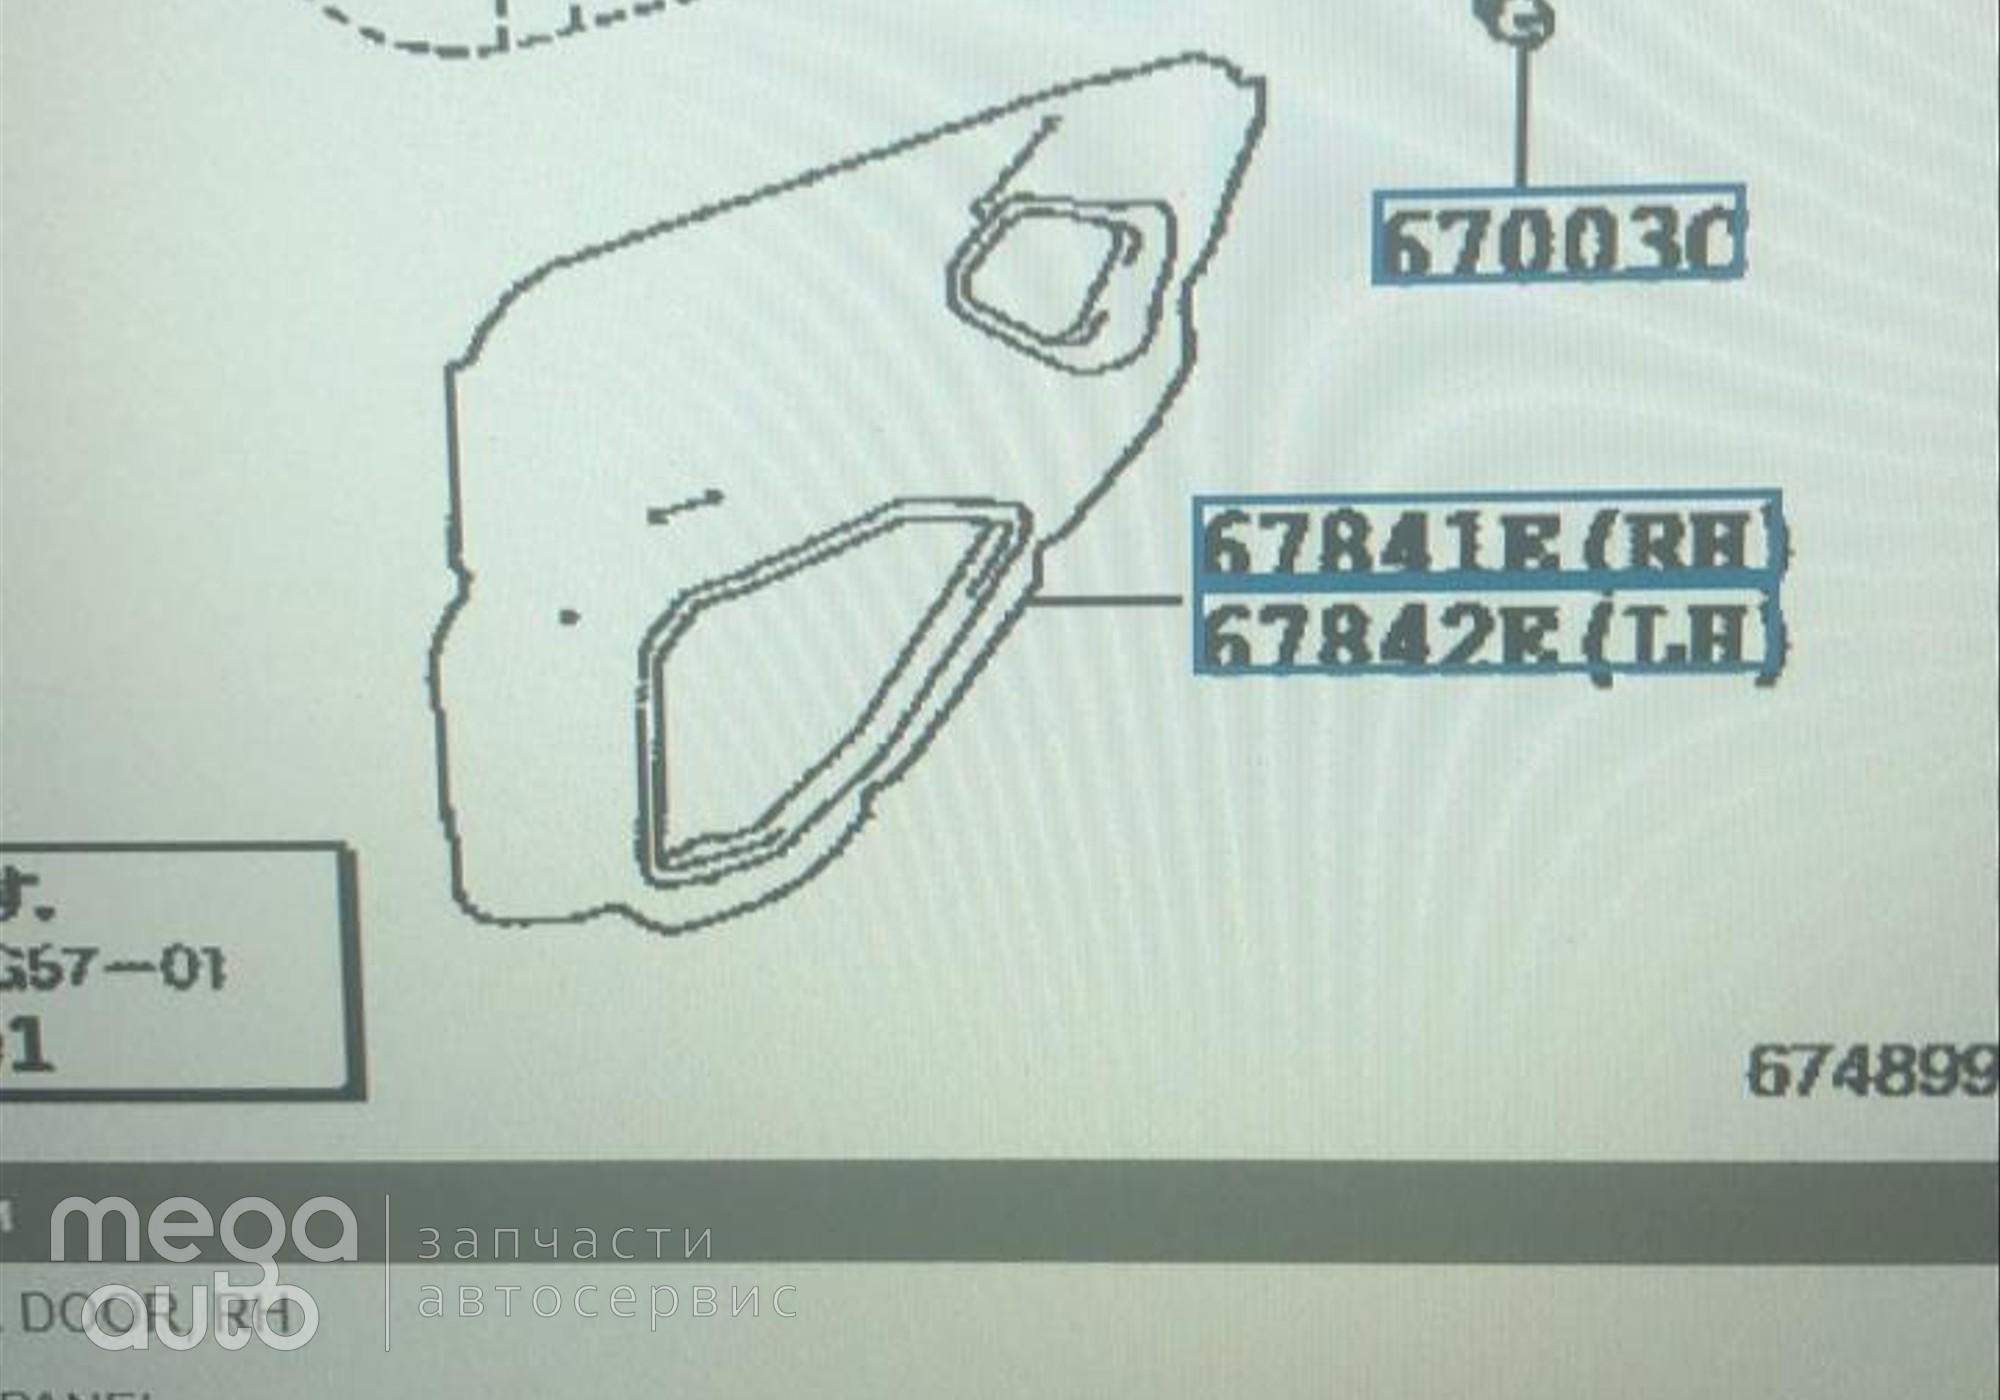 6784212170 Заглушка ручки двери левая для Toyota Corolla E140/E150 (с 2007 по 2013)